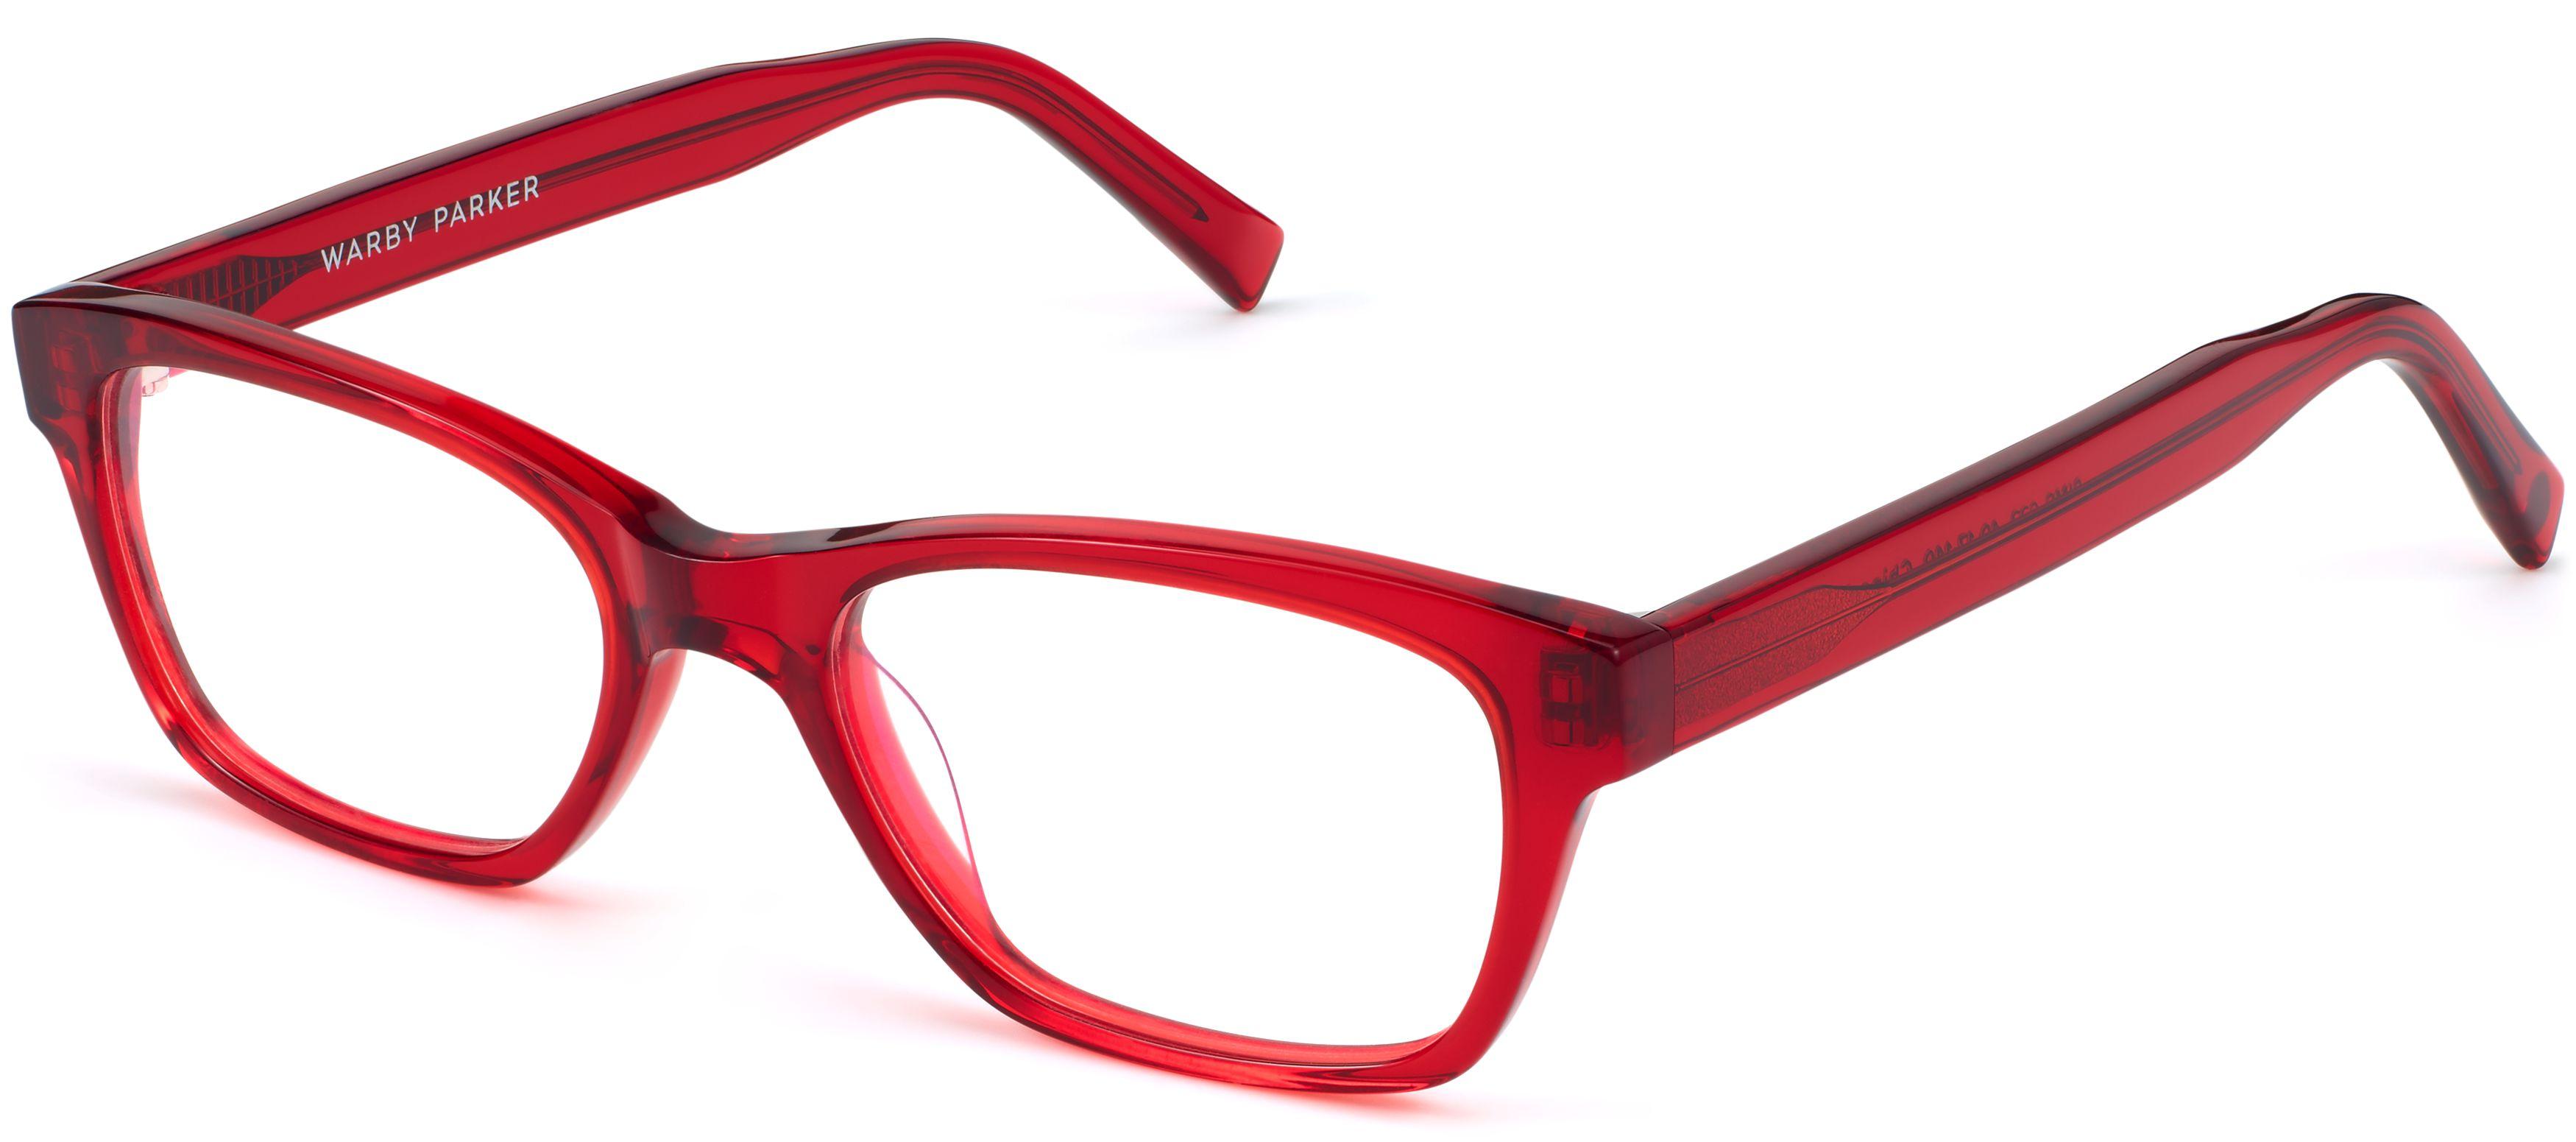 bbab9922b5 Sims Eyeglasses in Cardinal Crystal for Women